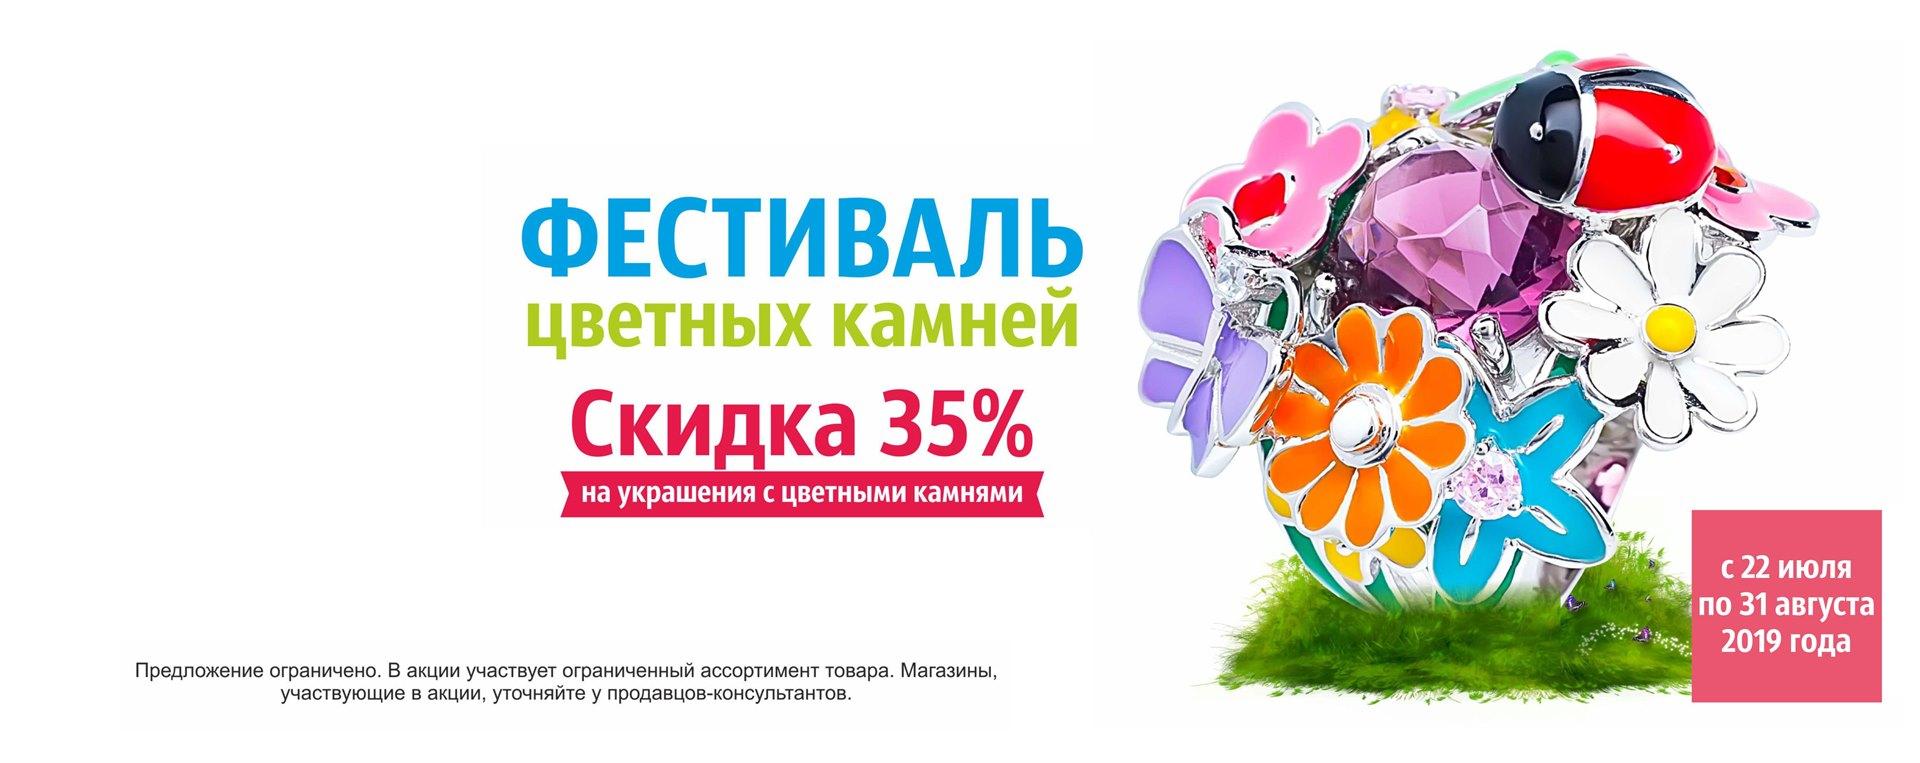 https://www.almazcom.ru/pub/img/Info/24/banner_na_sajt_FK.jpg